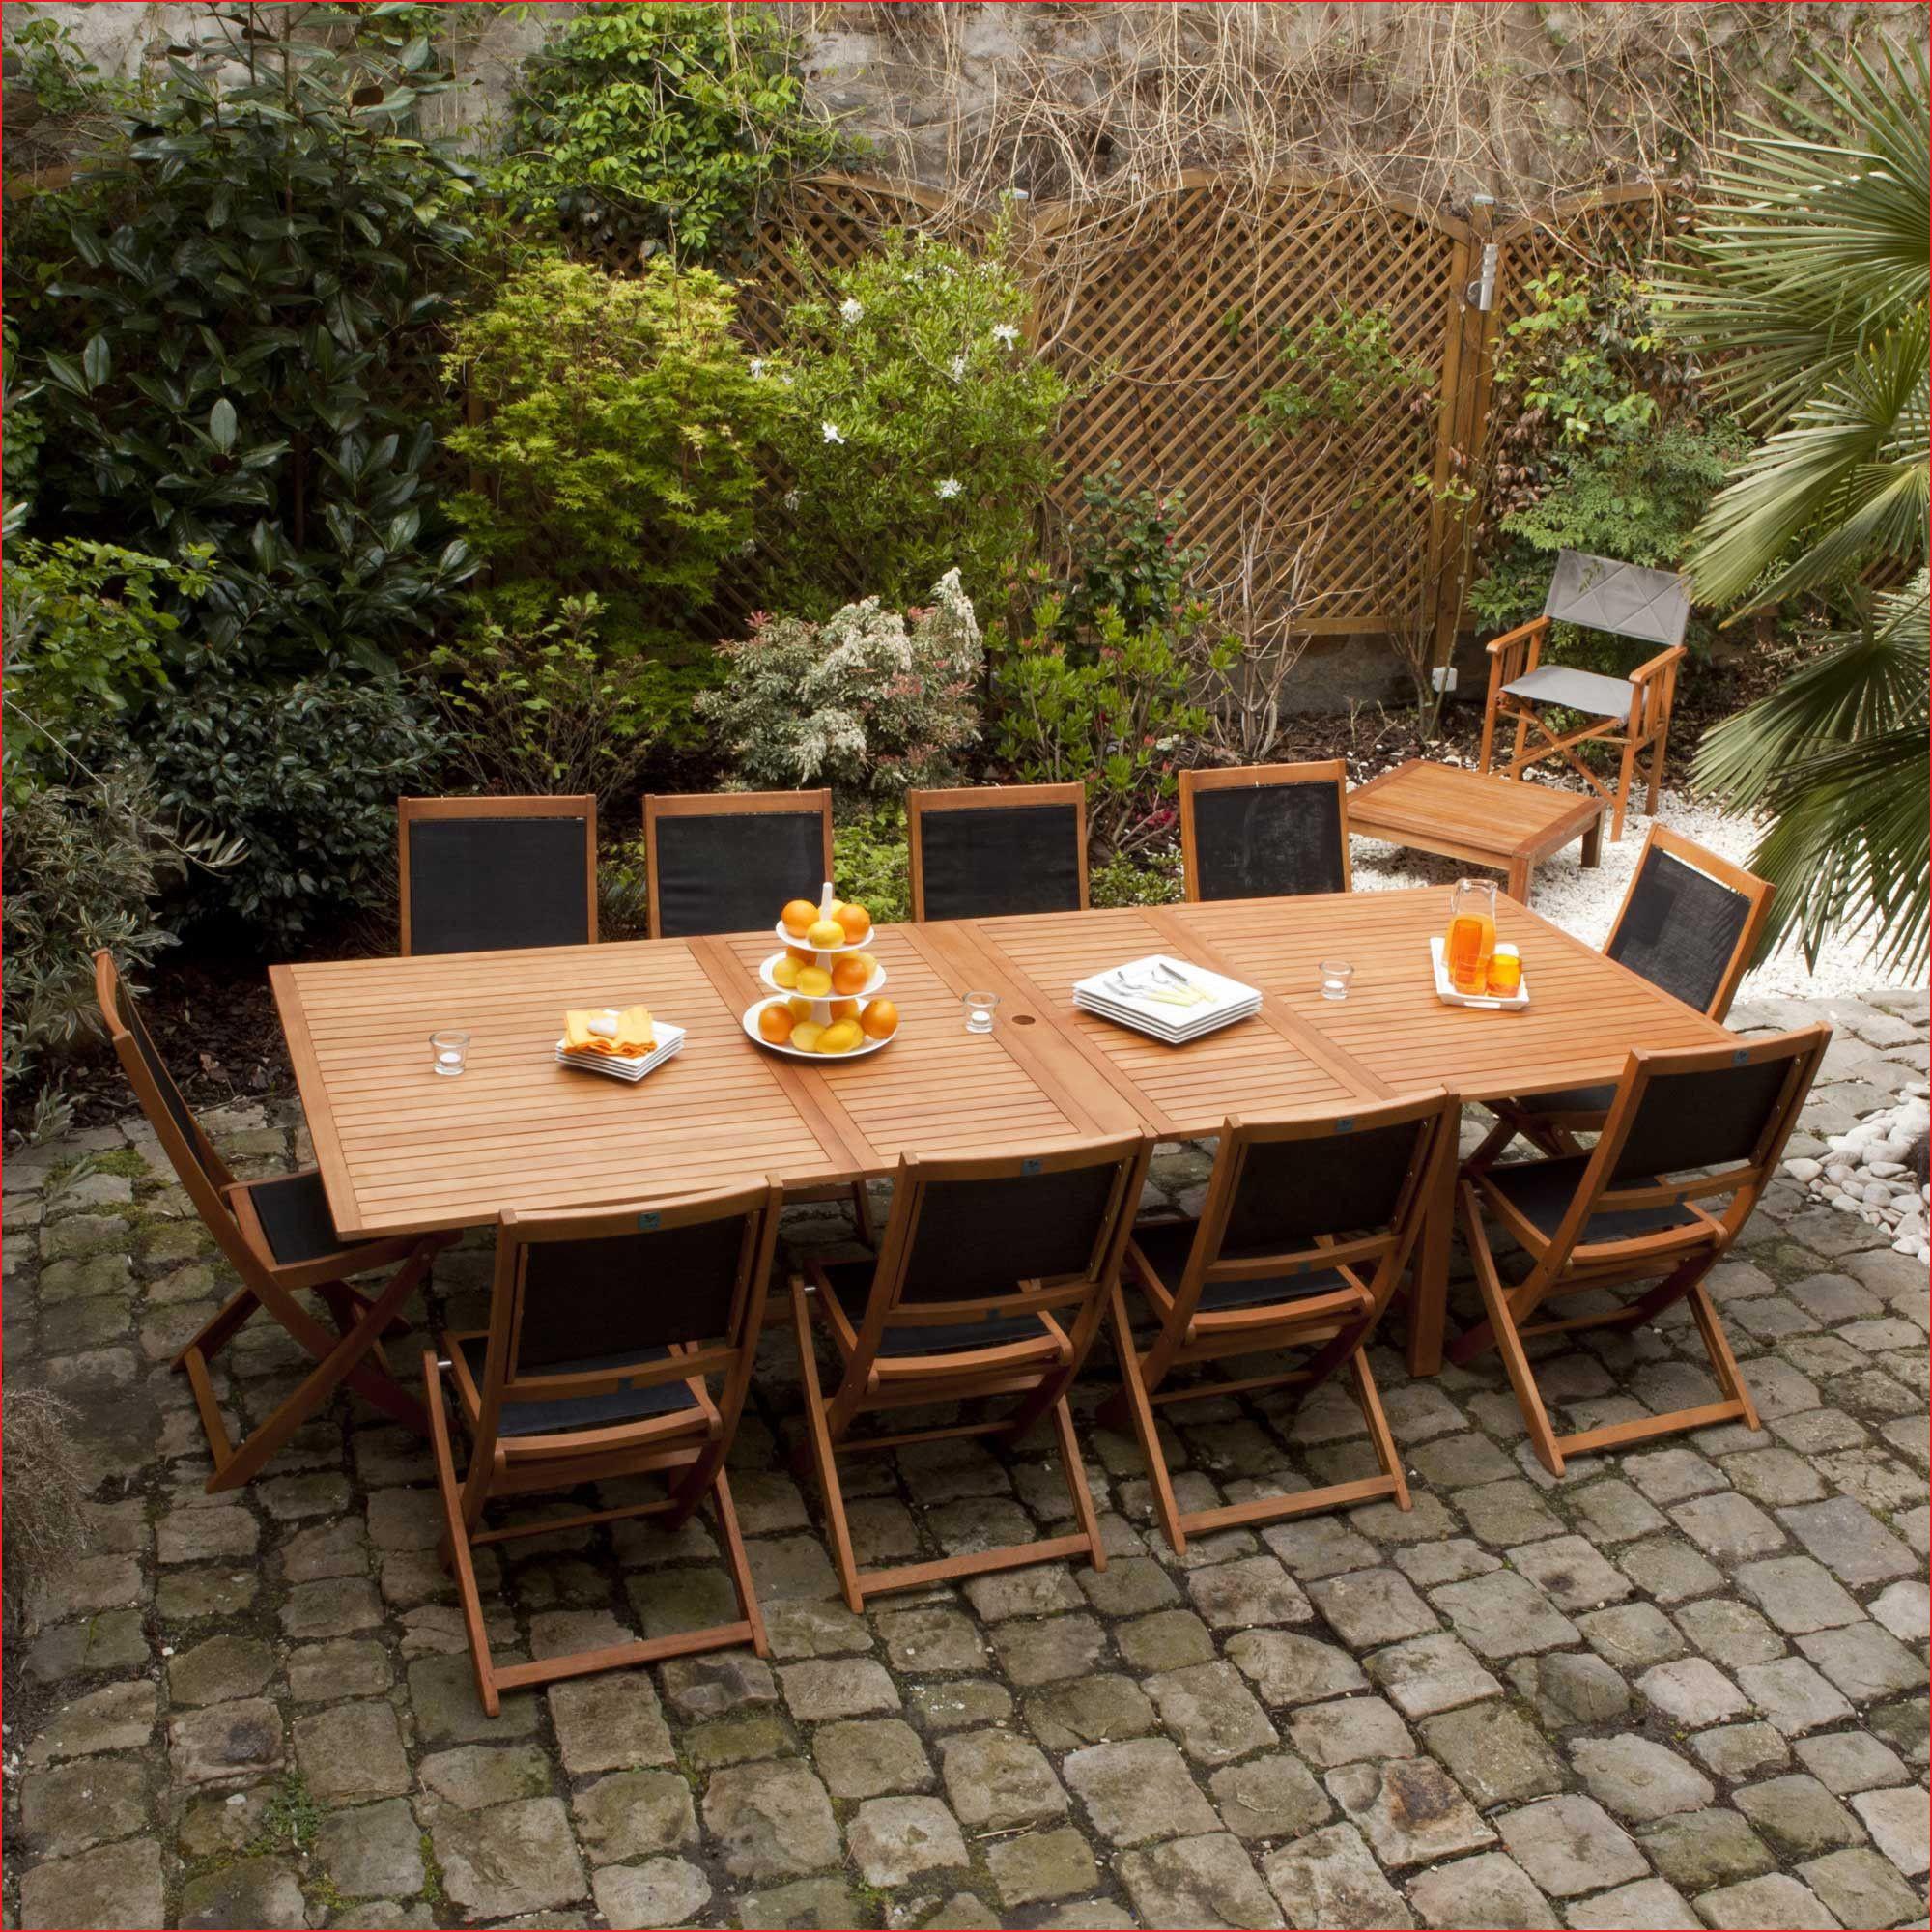 Table Teck Jardin Élégant Jardin Archives Francesginsberg ... destiné Salon De Jardin Avec Rallonge